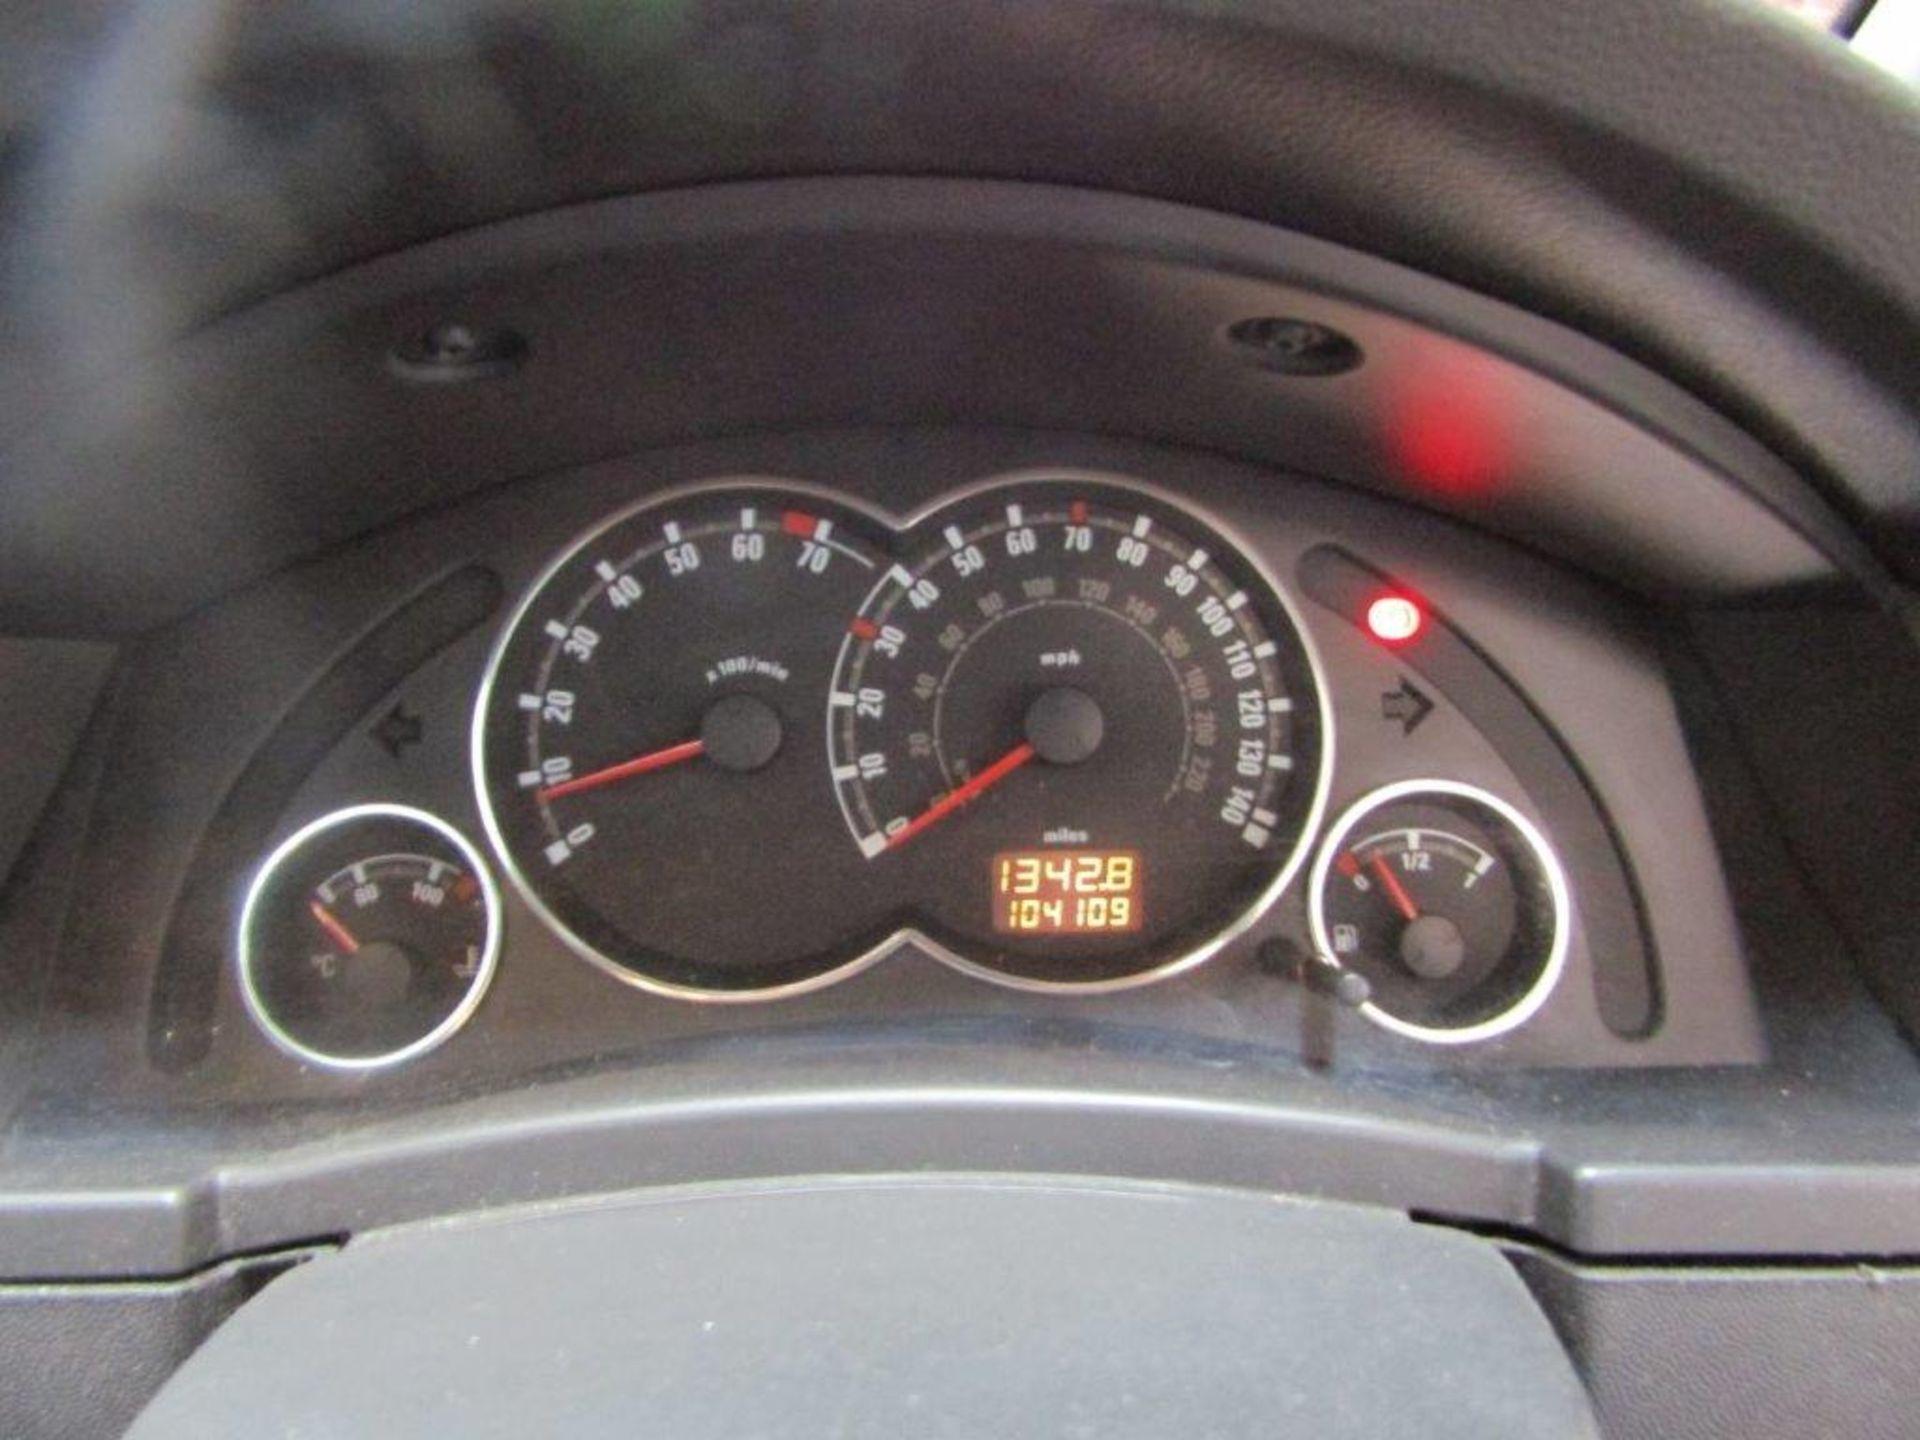 58 08 Vauxhall Meriva Design - Image 5 of 25